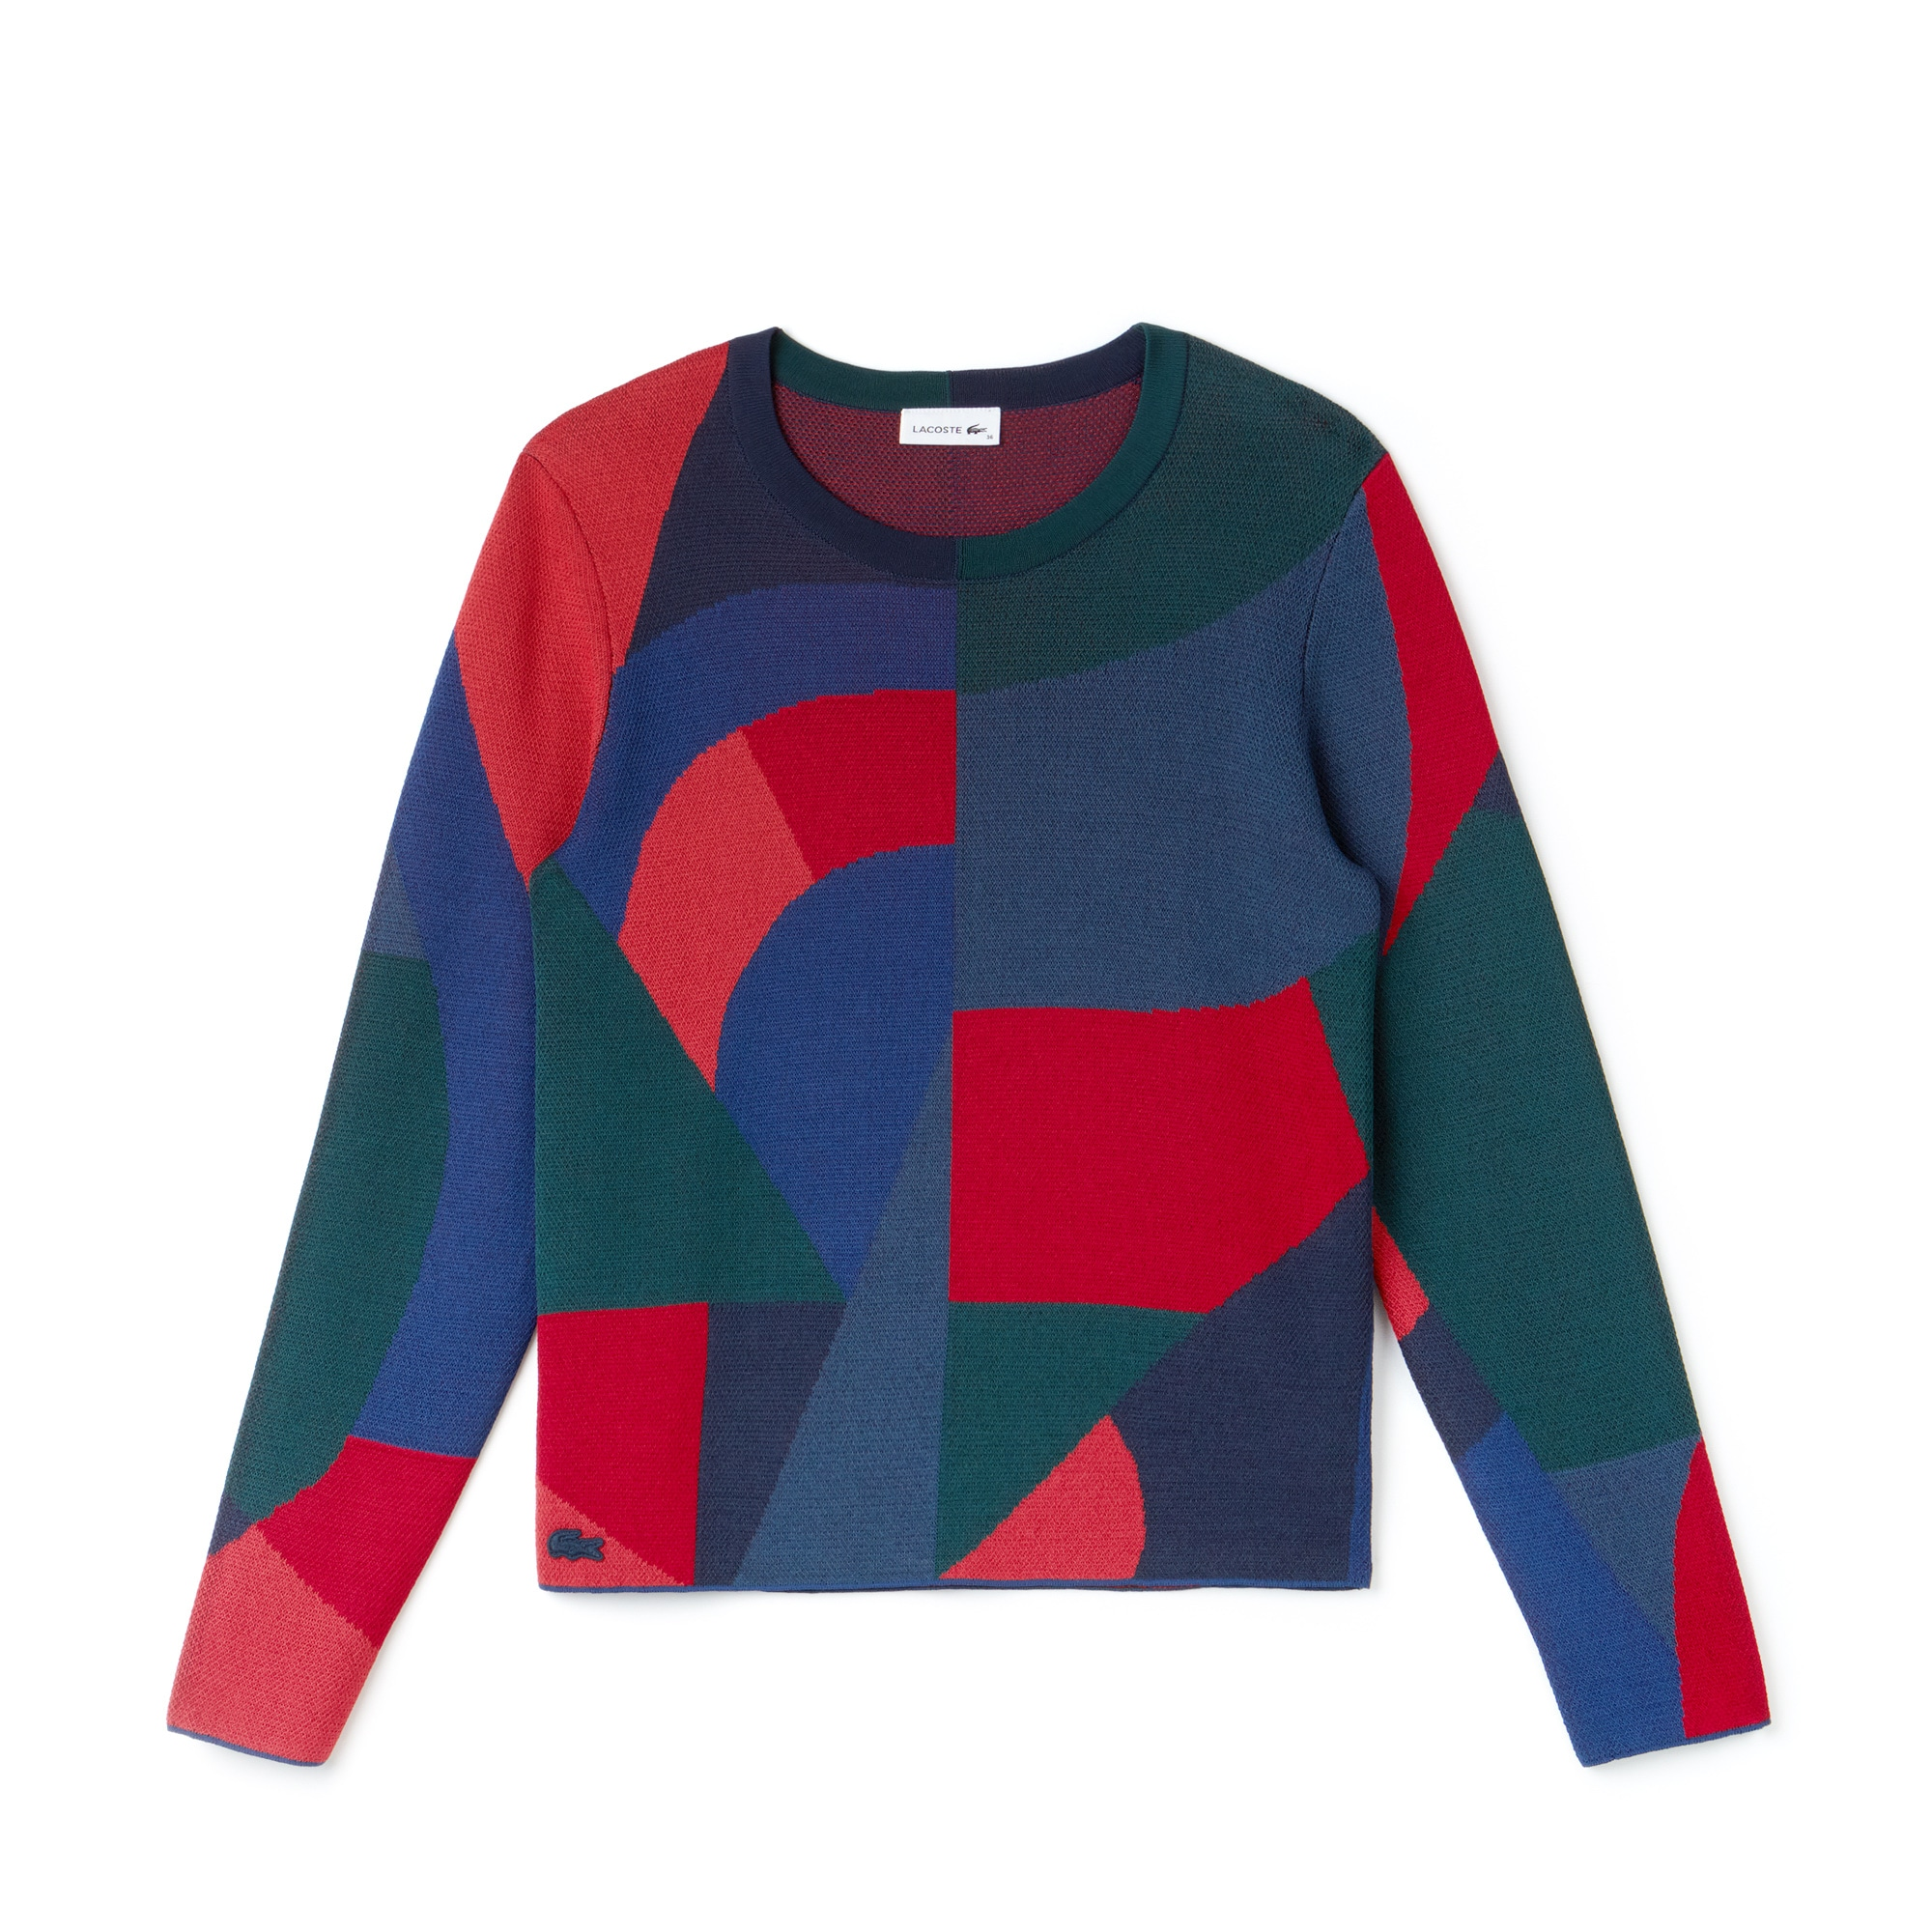 Sweater dames jacquard ronde hals colorblock met print